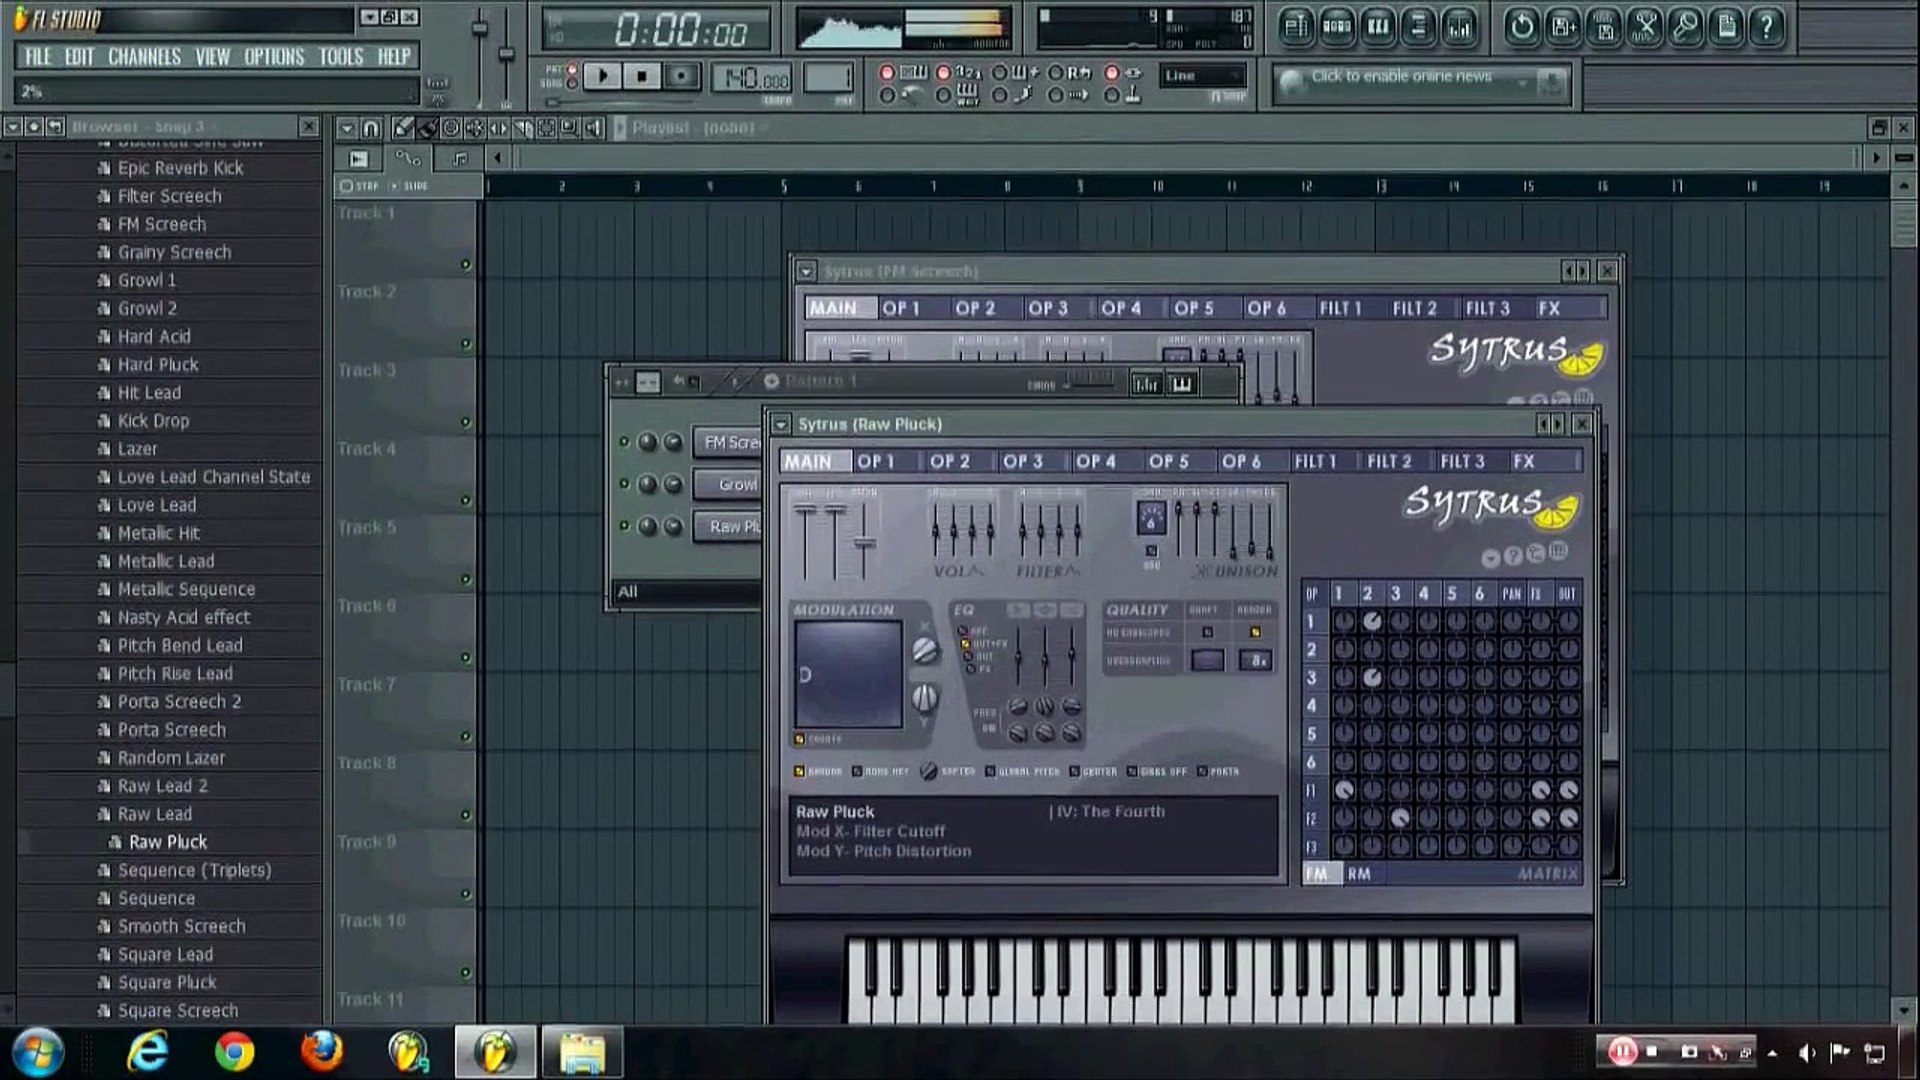 FL Studio Sytrus Tutorial: Robotic Growl Synth